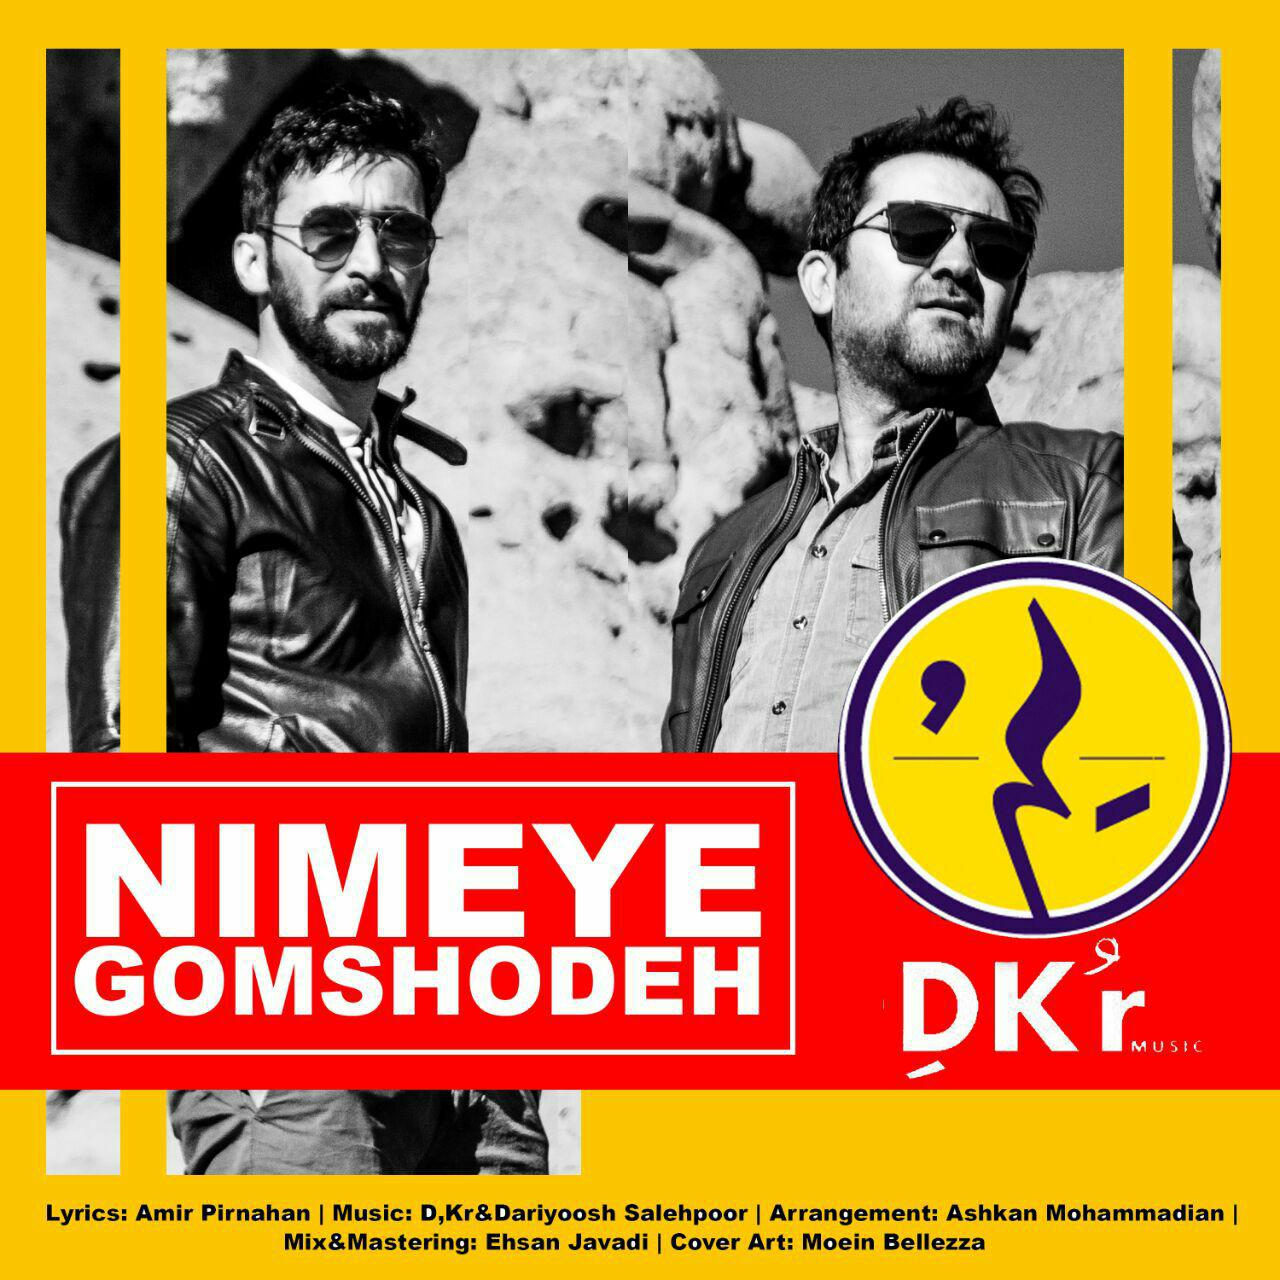 D,kr – Nimeye Gomshodeh